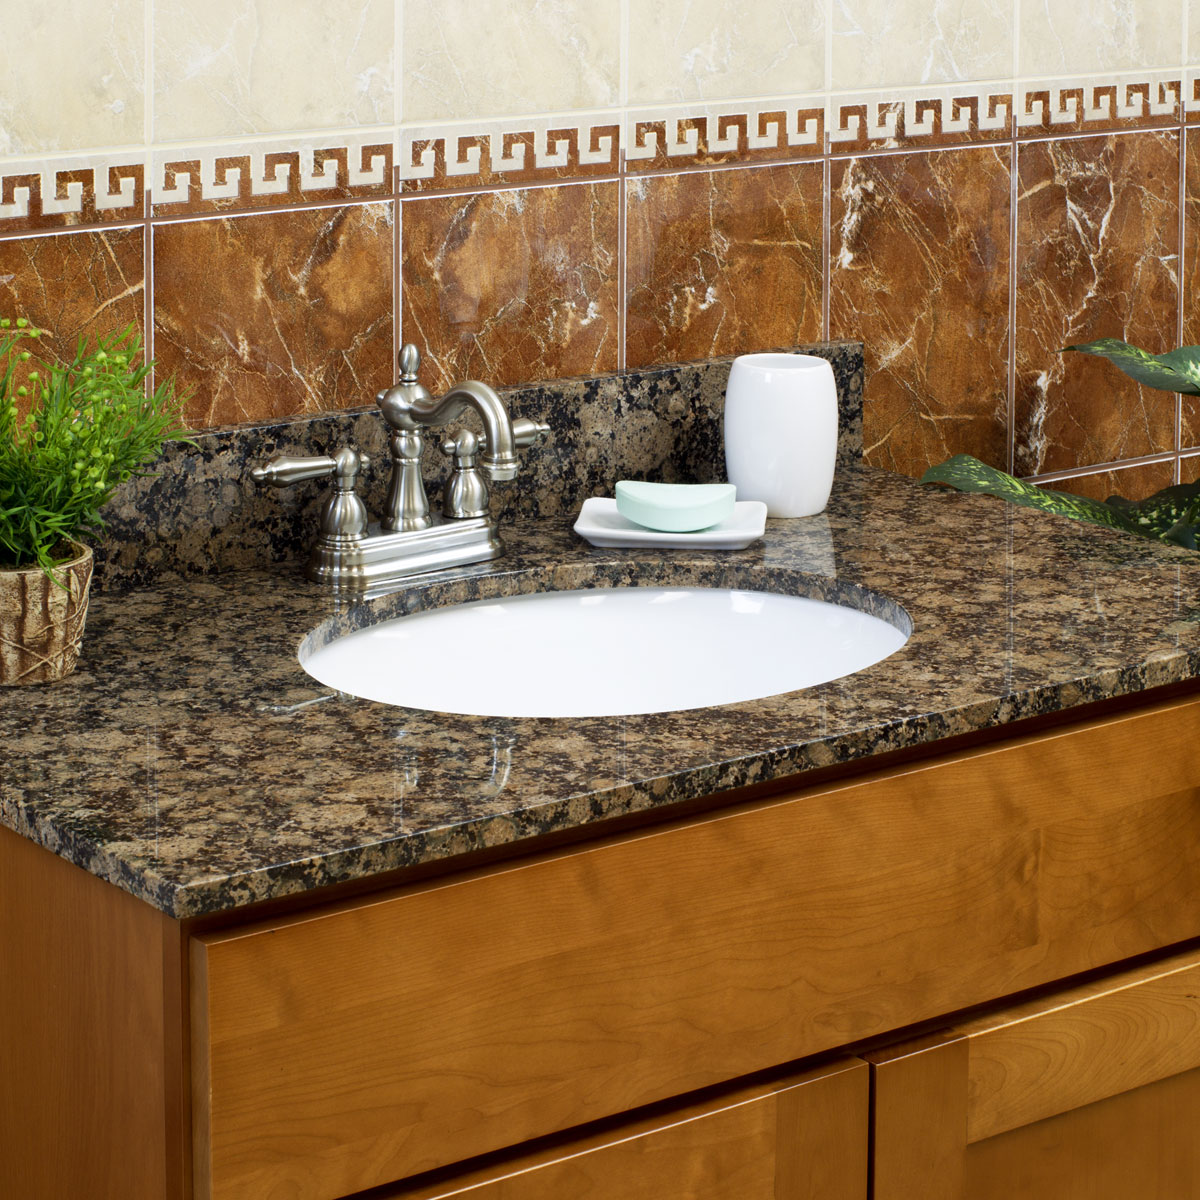 48 kitchen sink base cabinet fridge lesscare newport quot bathroom maple vanity